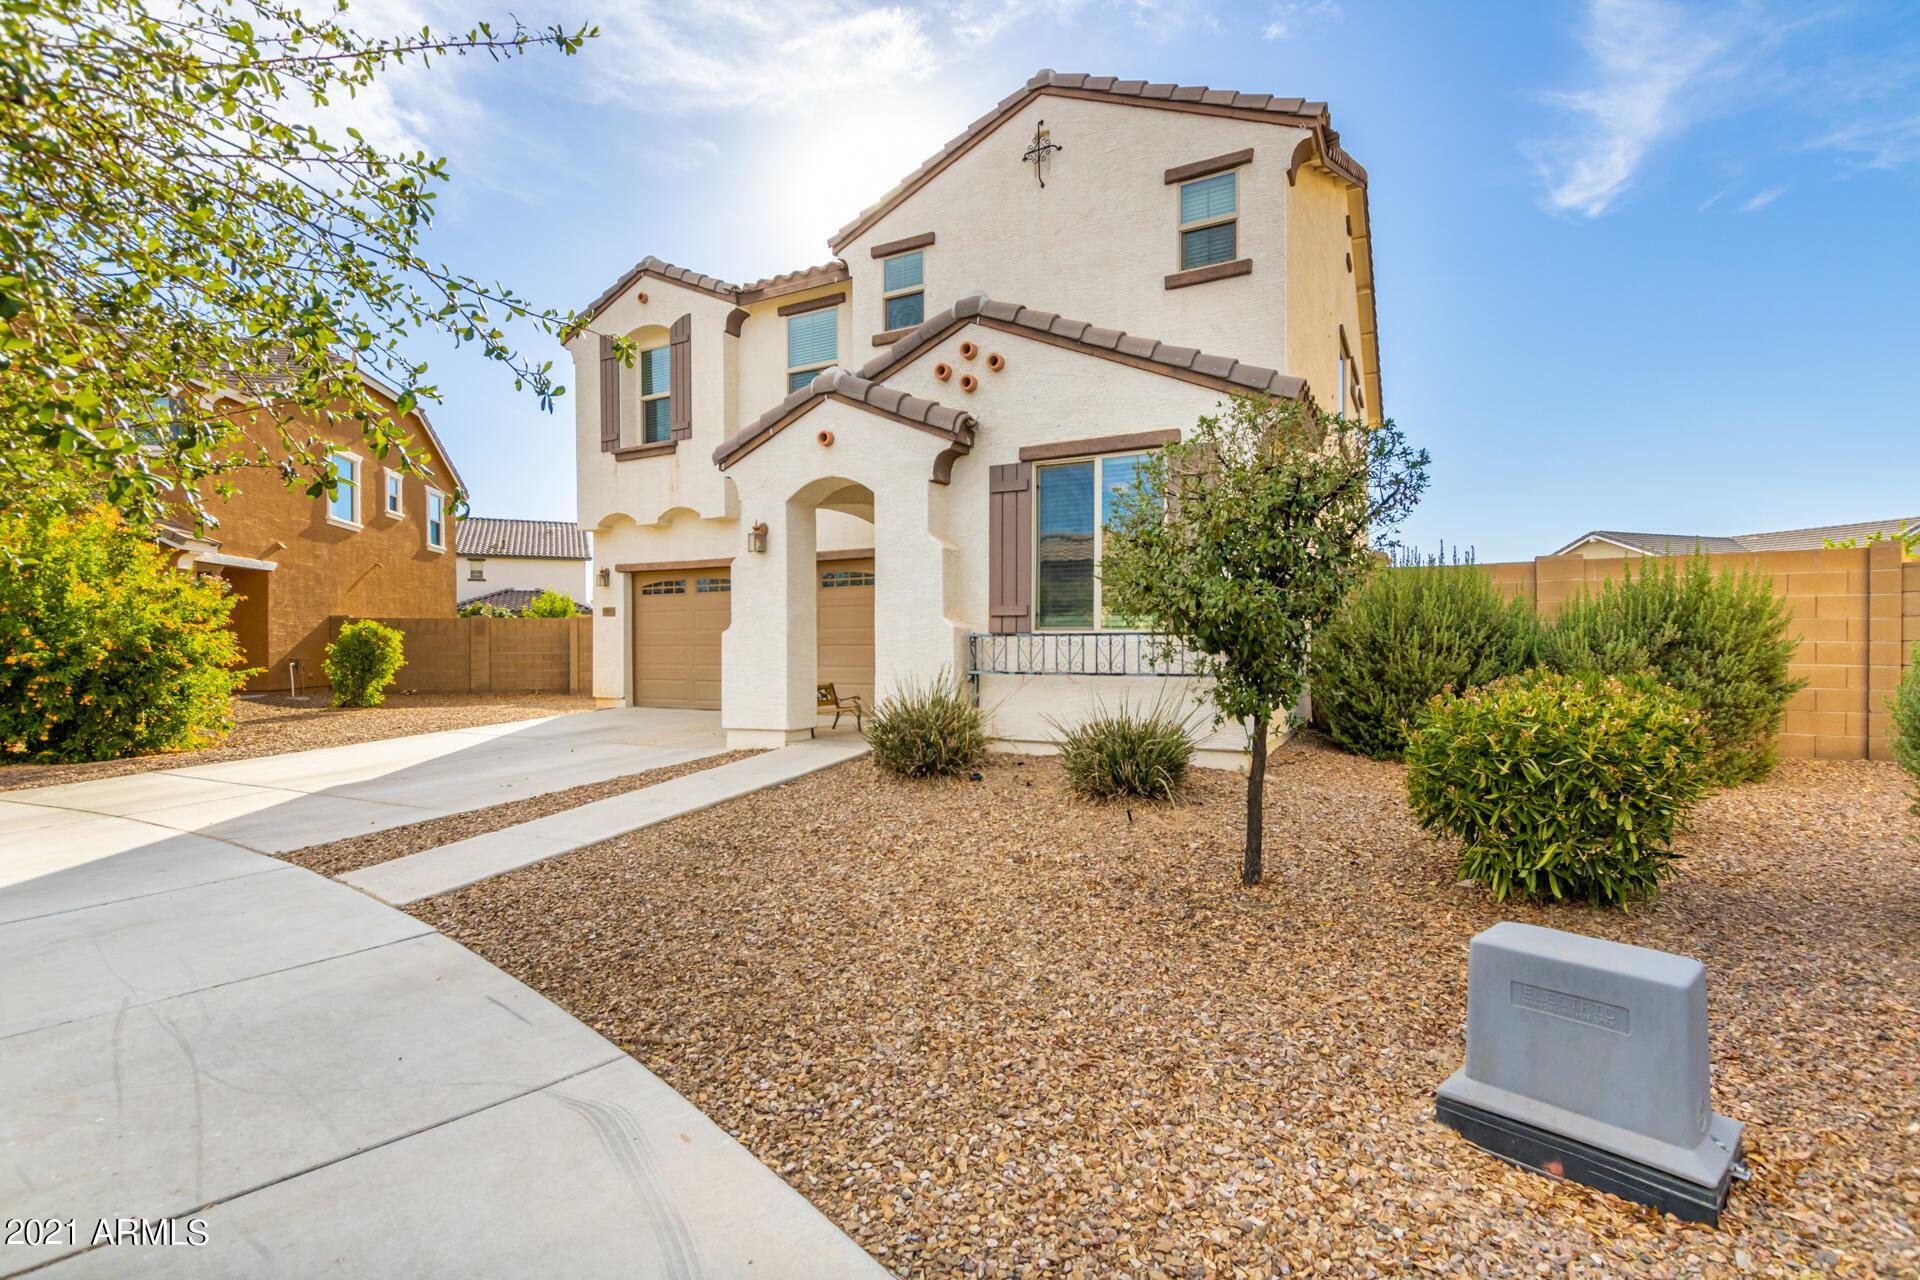 Photo of 21044 E CHERRYWOOD Drive, Queen Creek, AZ 85142 (MLS # 6242437)